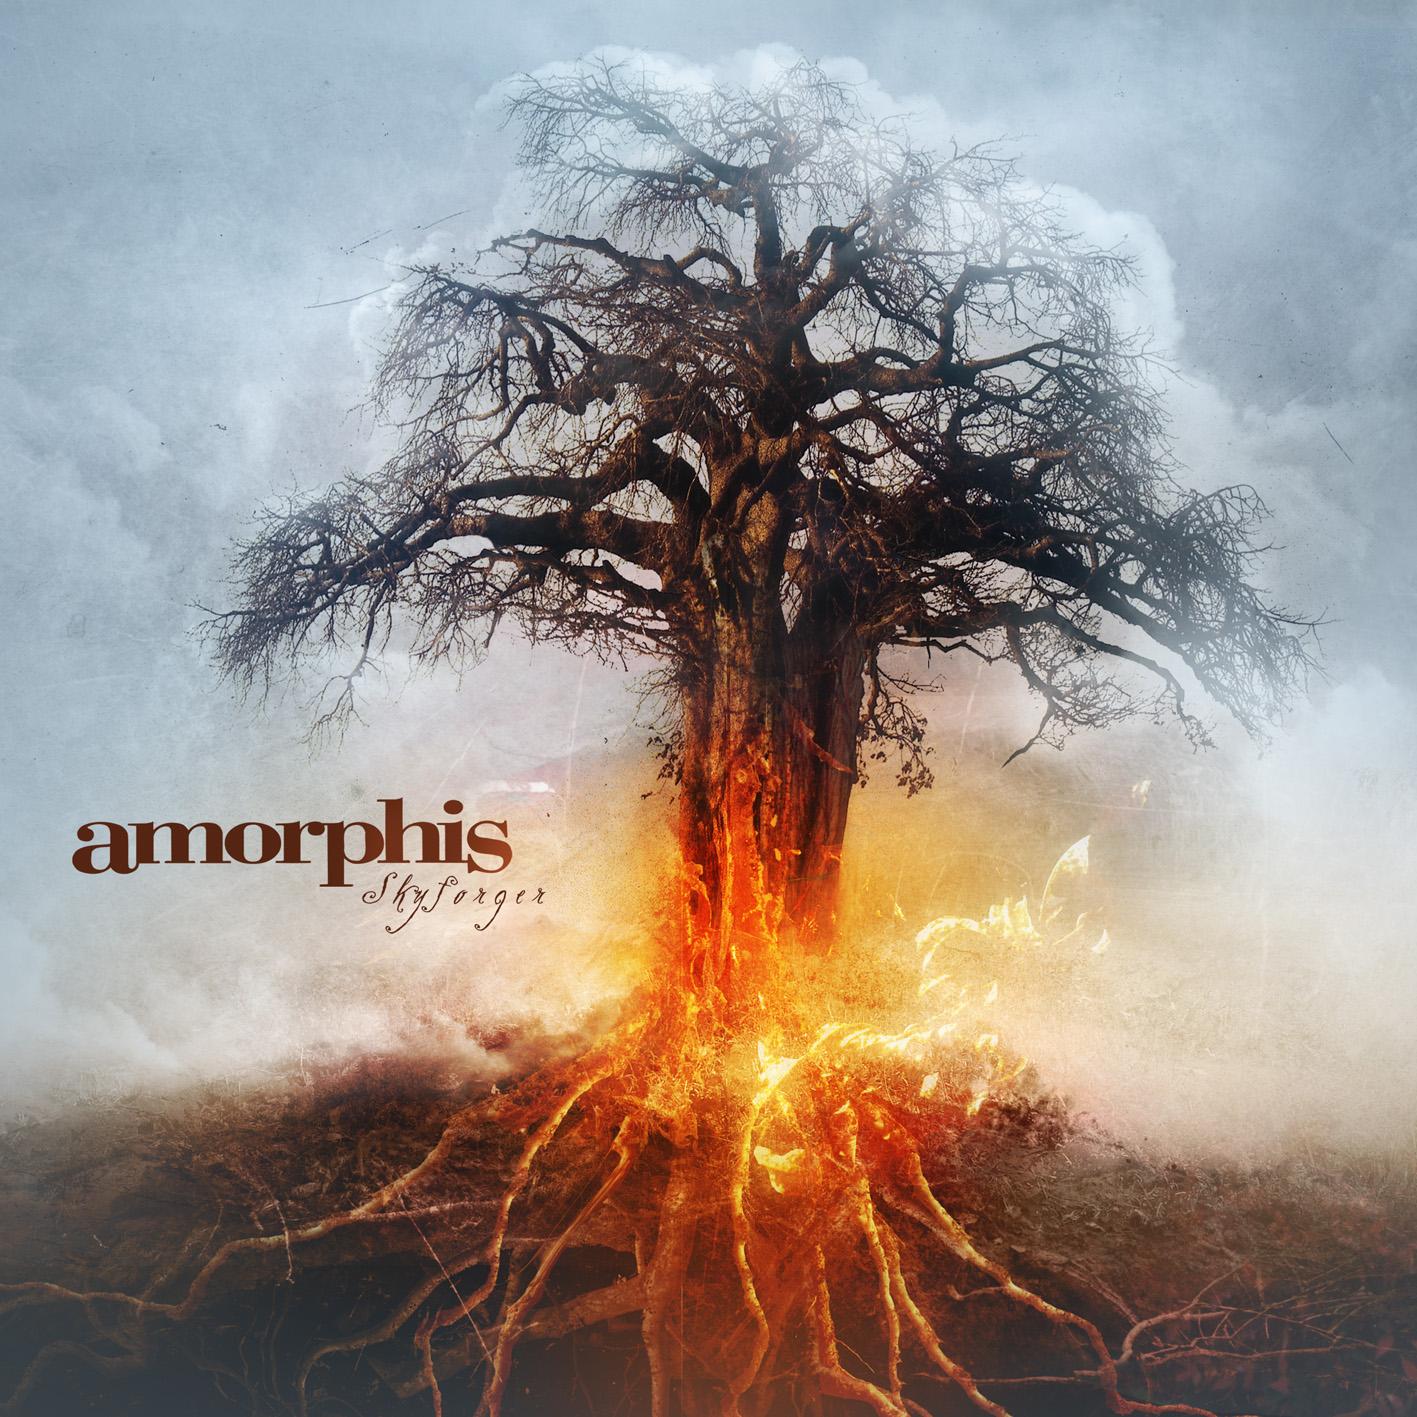 amorphis-2009-skyforger.jpg